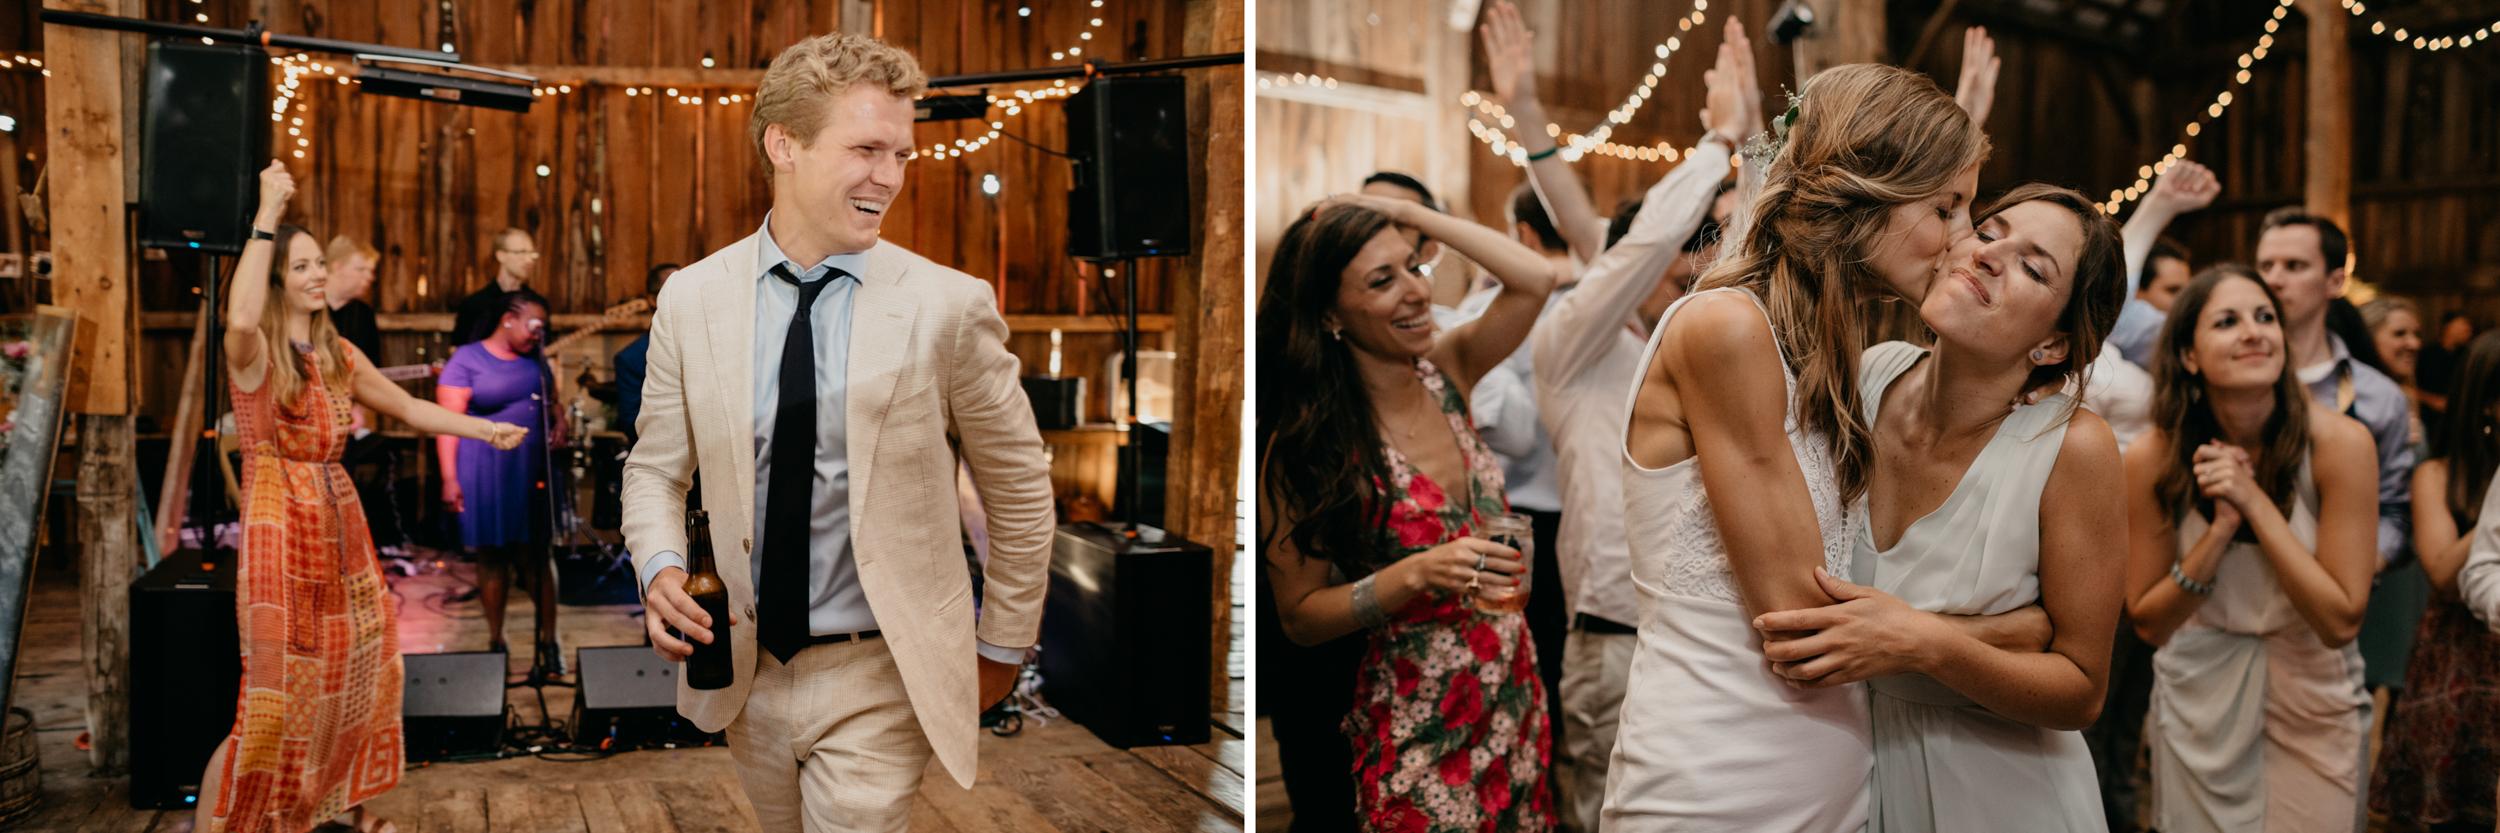 Karen_Alex_Bliss_ridge_farm_Vermont_wedding034.jpg